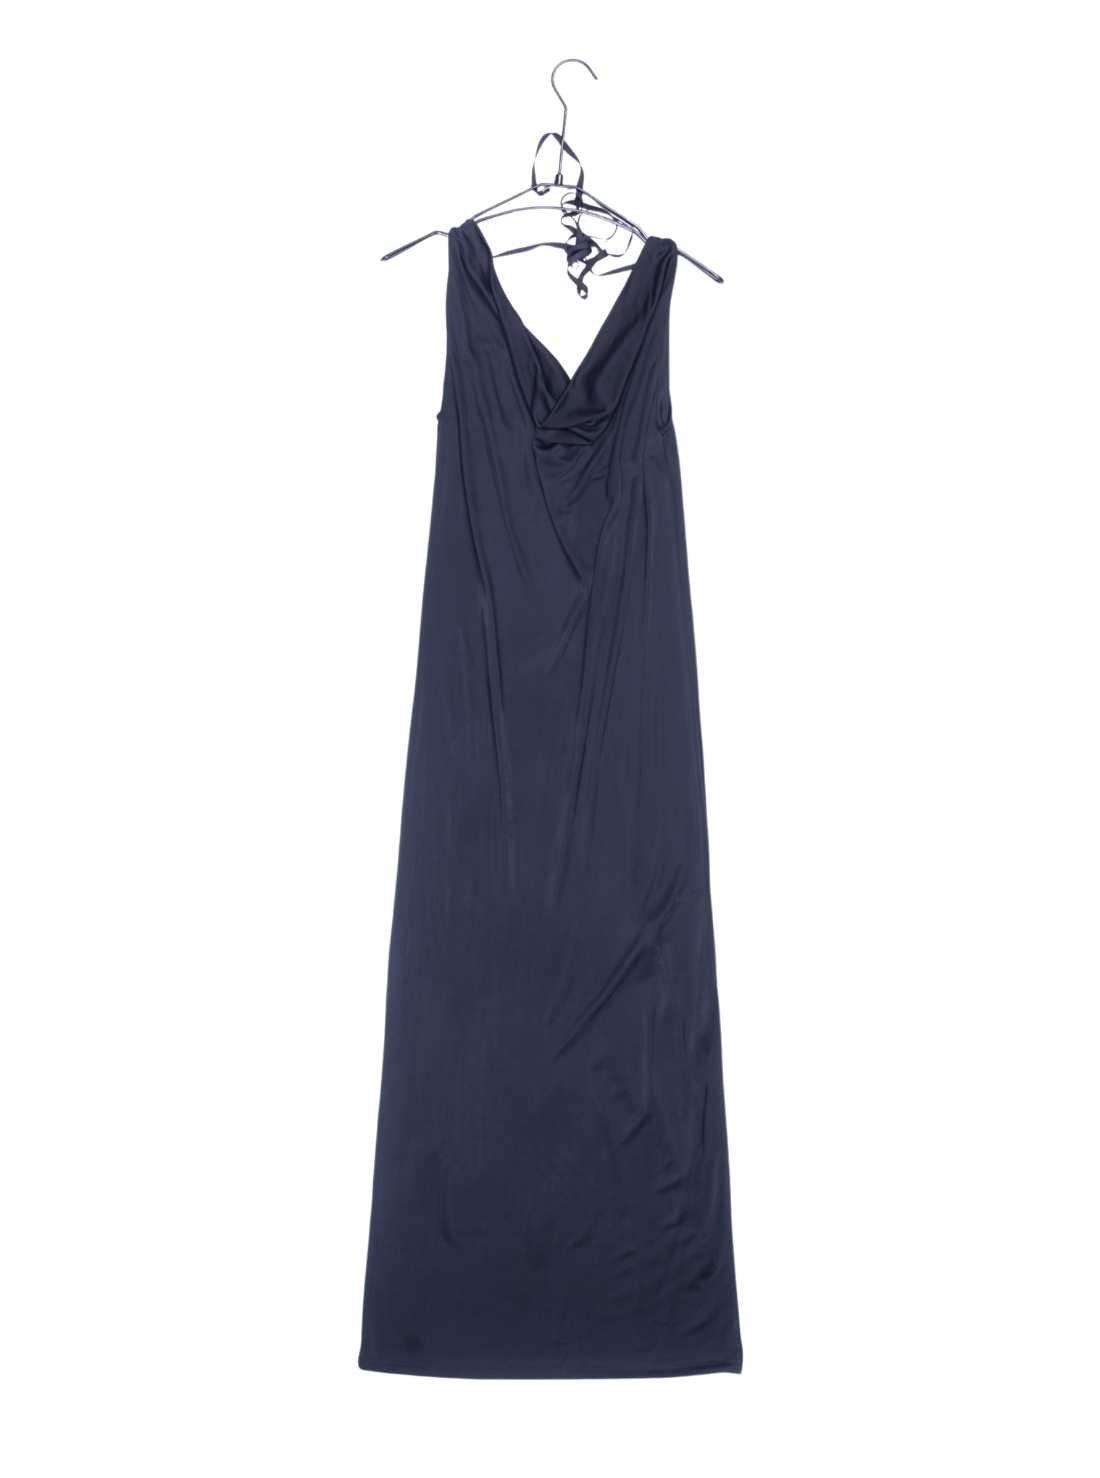 Silk Jersey Sleeveless Sexy Neck Party Dress